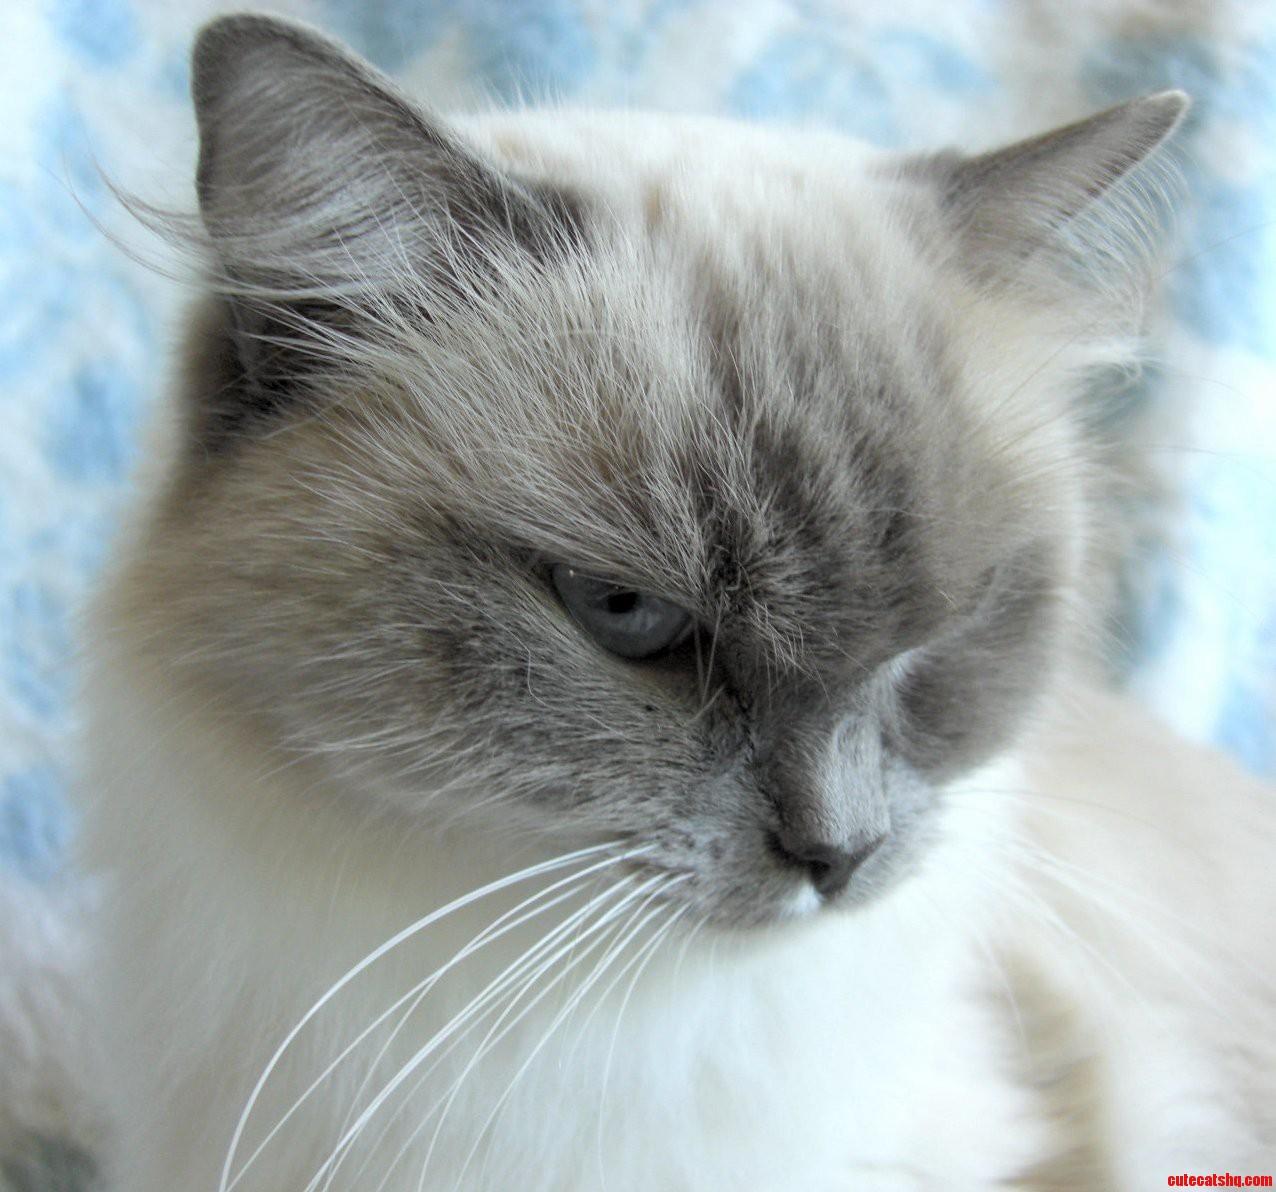 My Favourite Photo Of My Cat